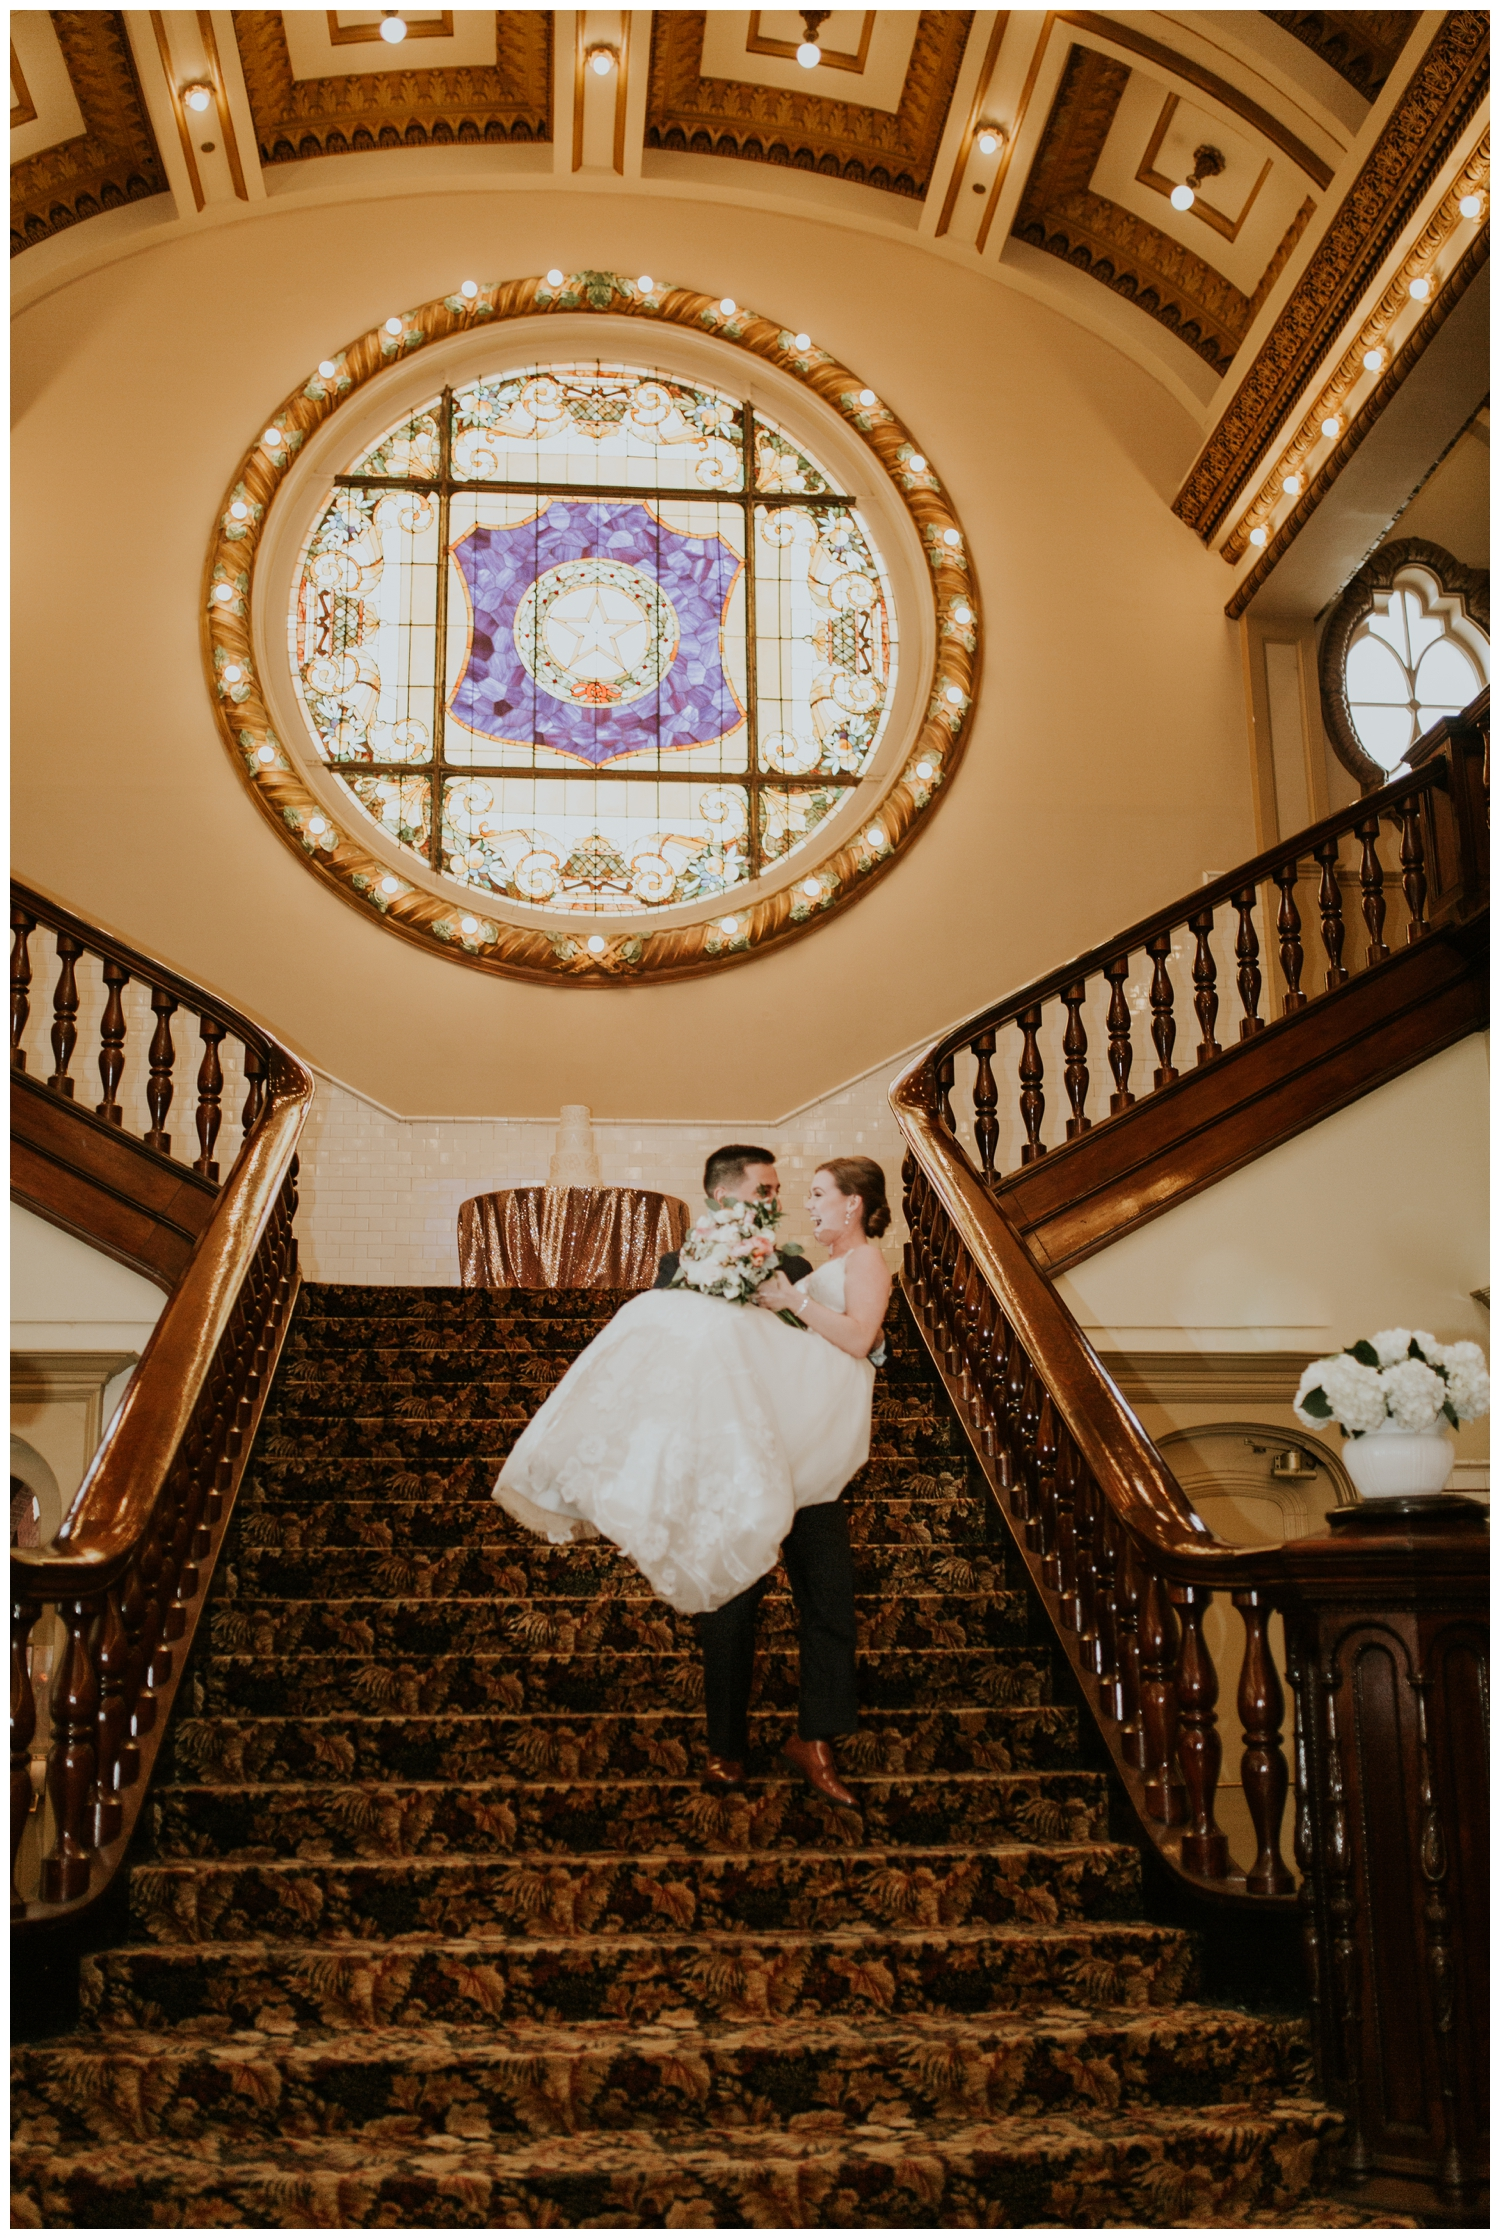 Jenna+Brandon, Mission Concepcion Wedding, San Antonio, Contista Productions Wedding Photography_0163.jpg